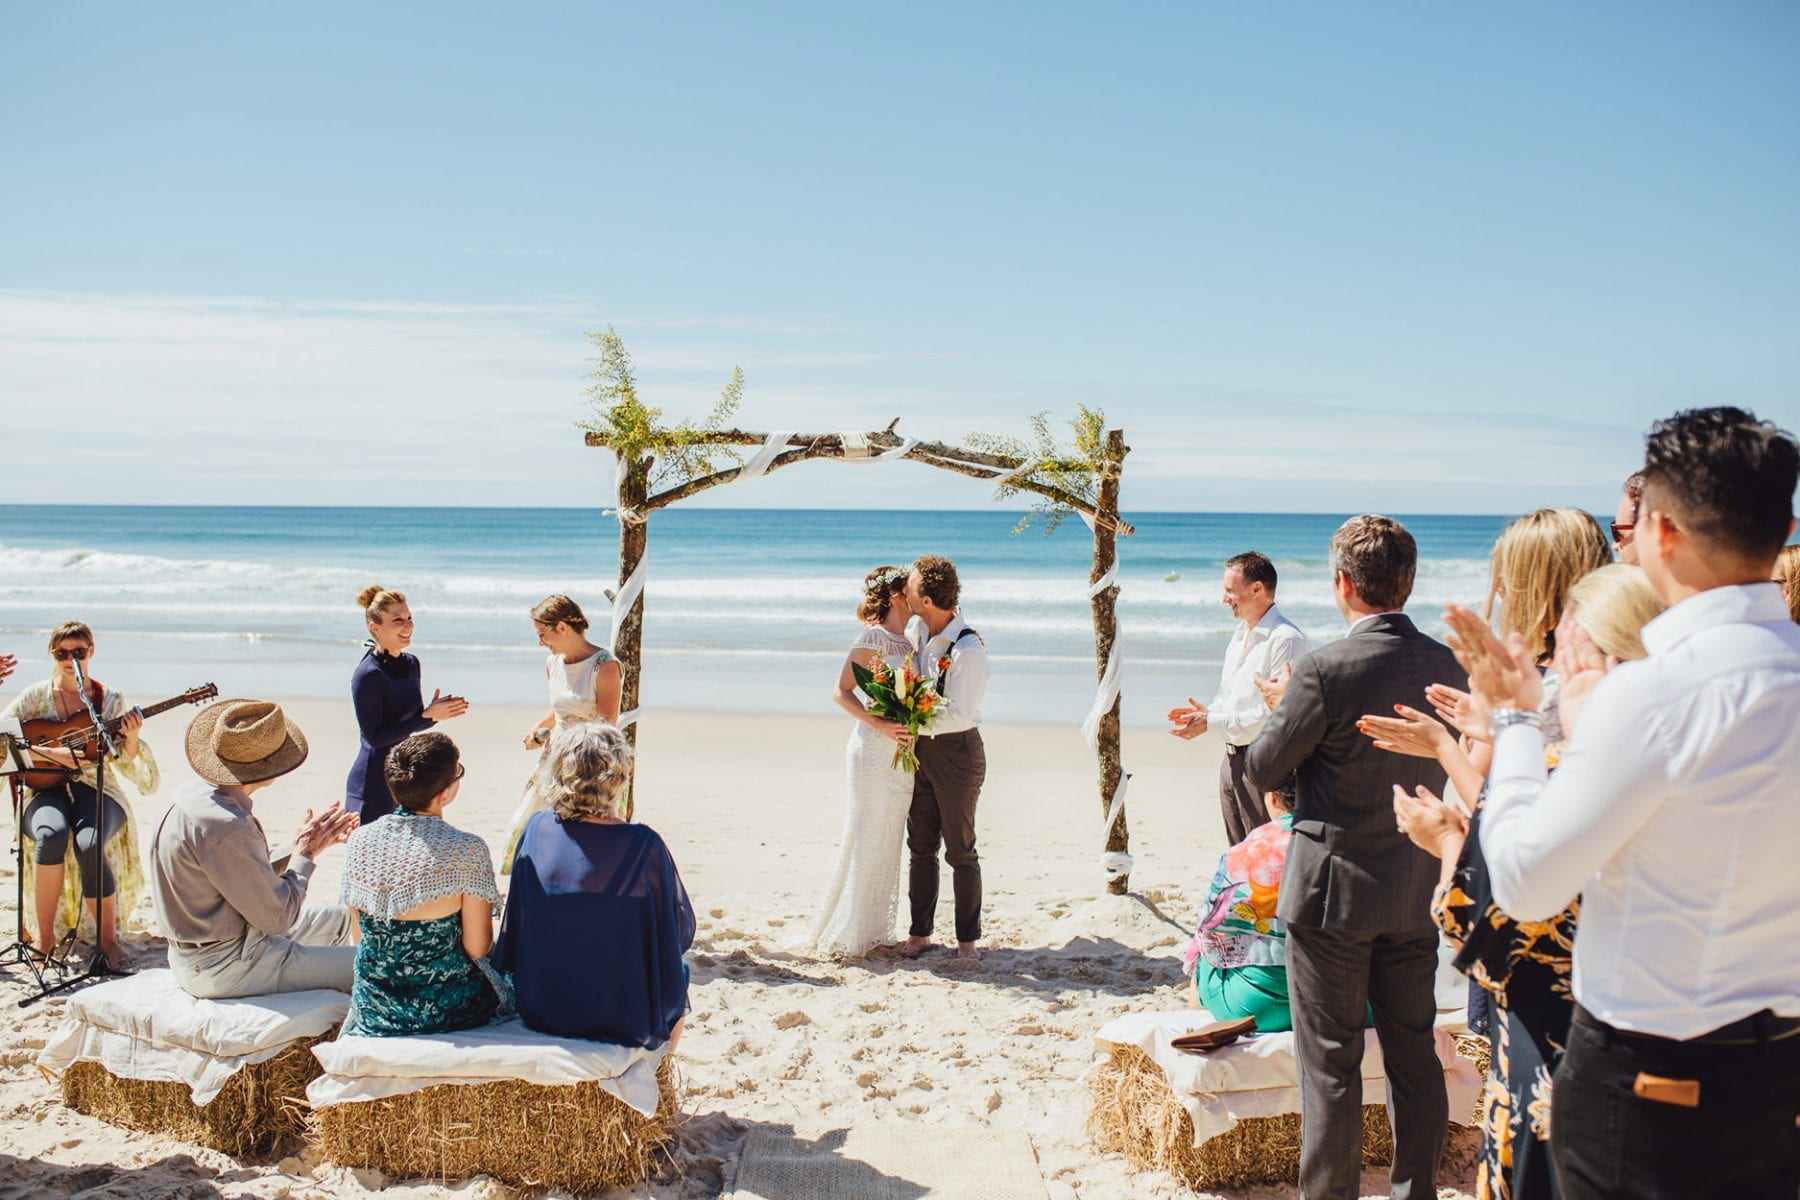 beach wedding photographer northern beaches sydney